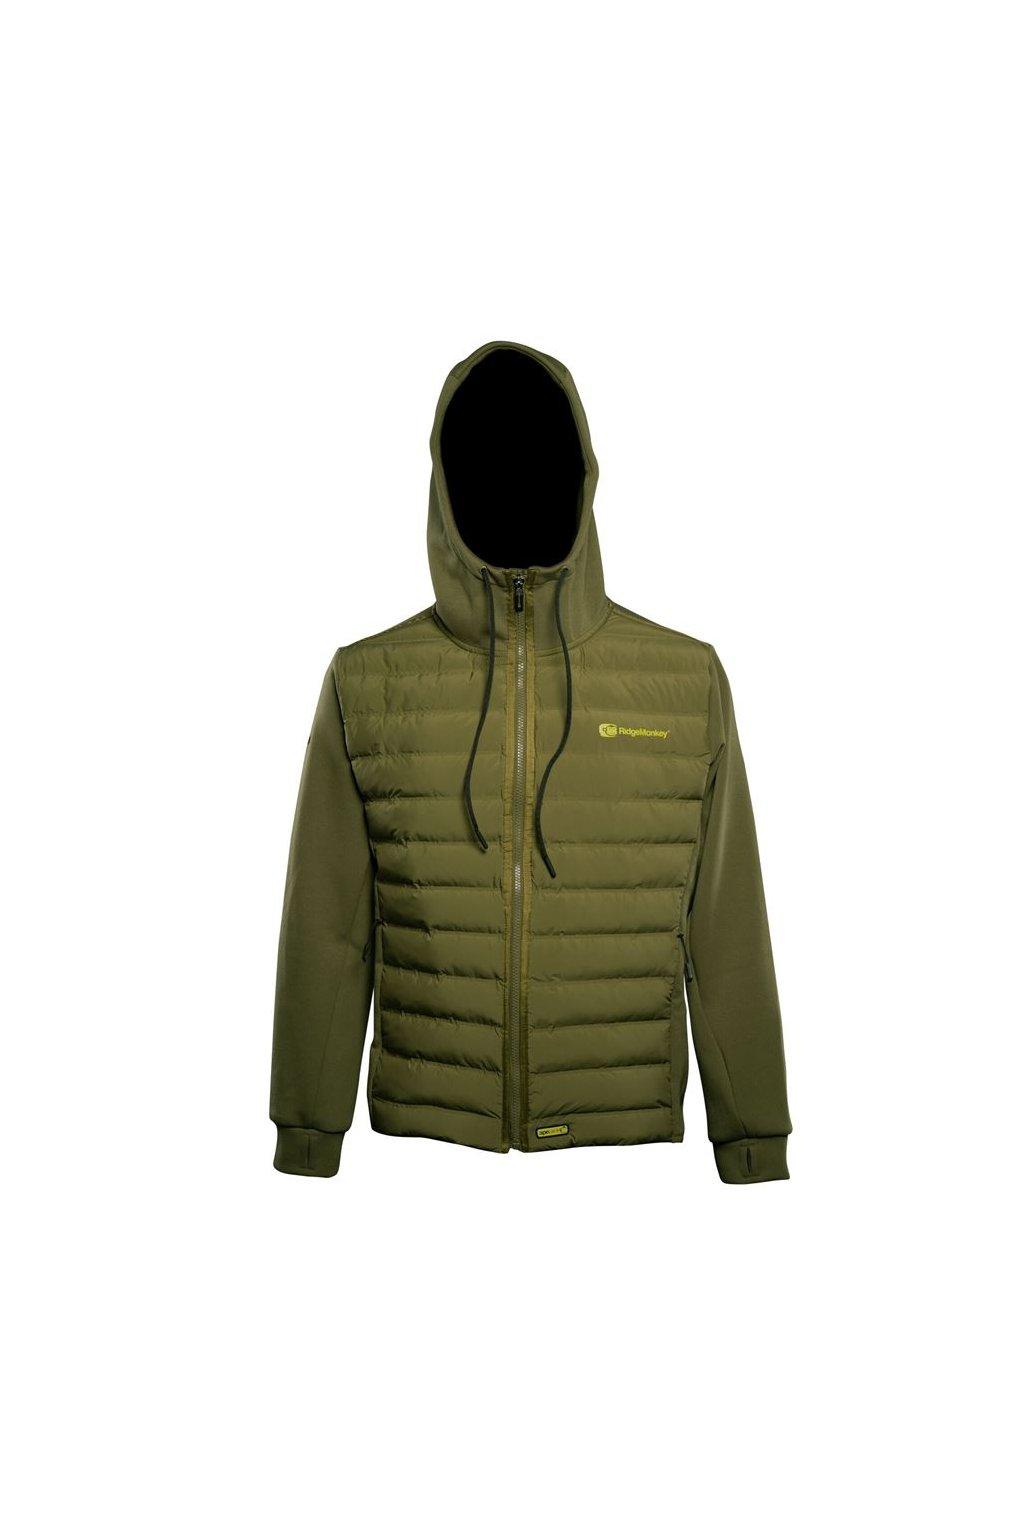 RidgeMonkey Bunda APEarel Dropback Heavyweight Zip Jacket Green